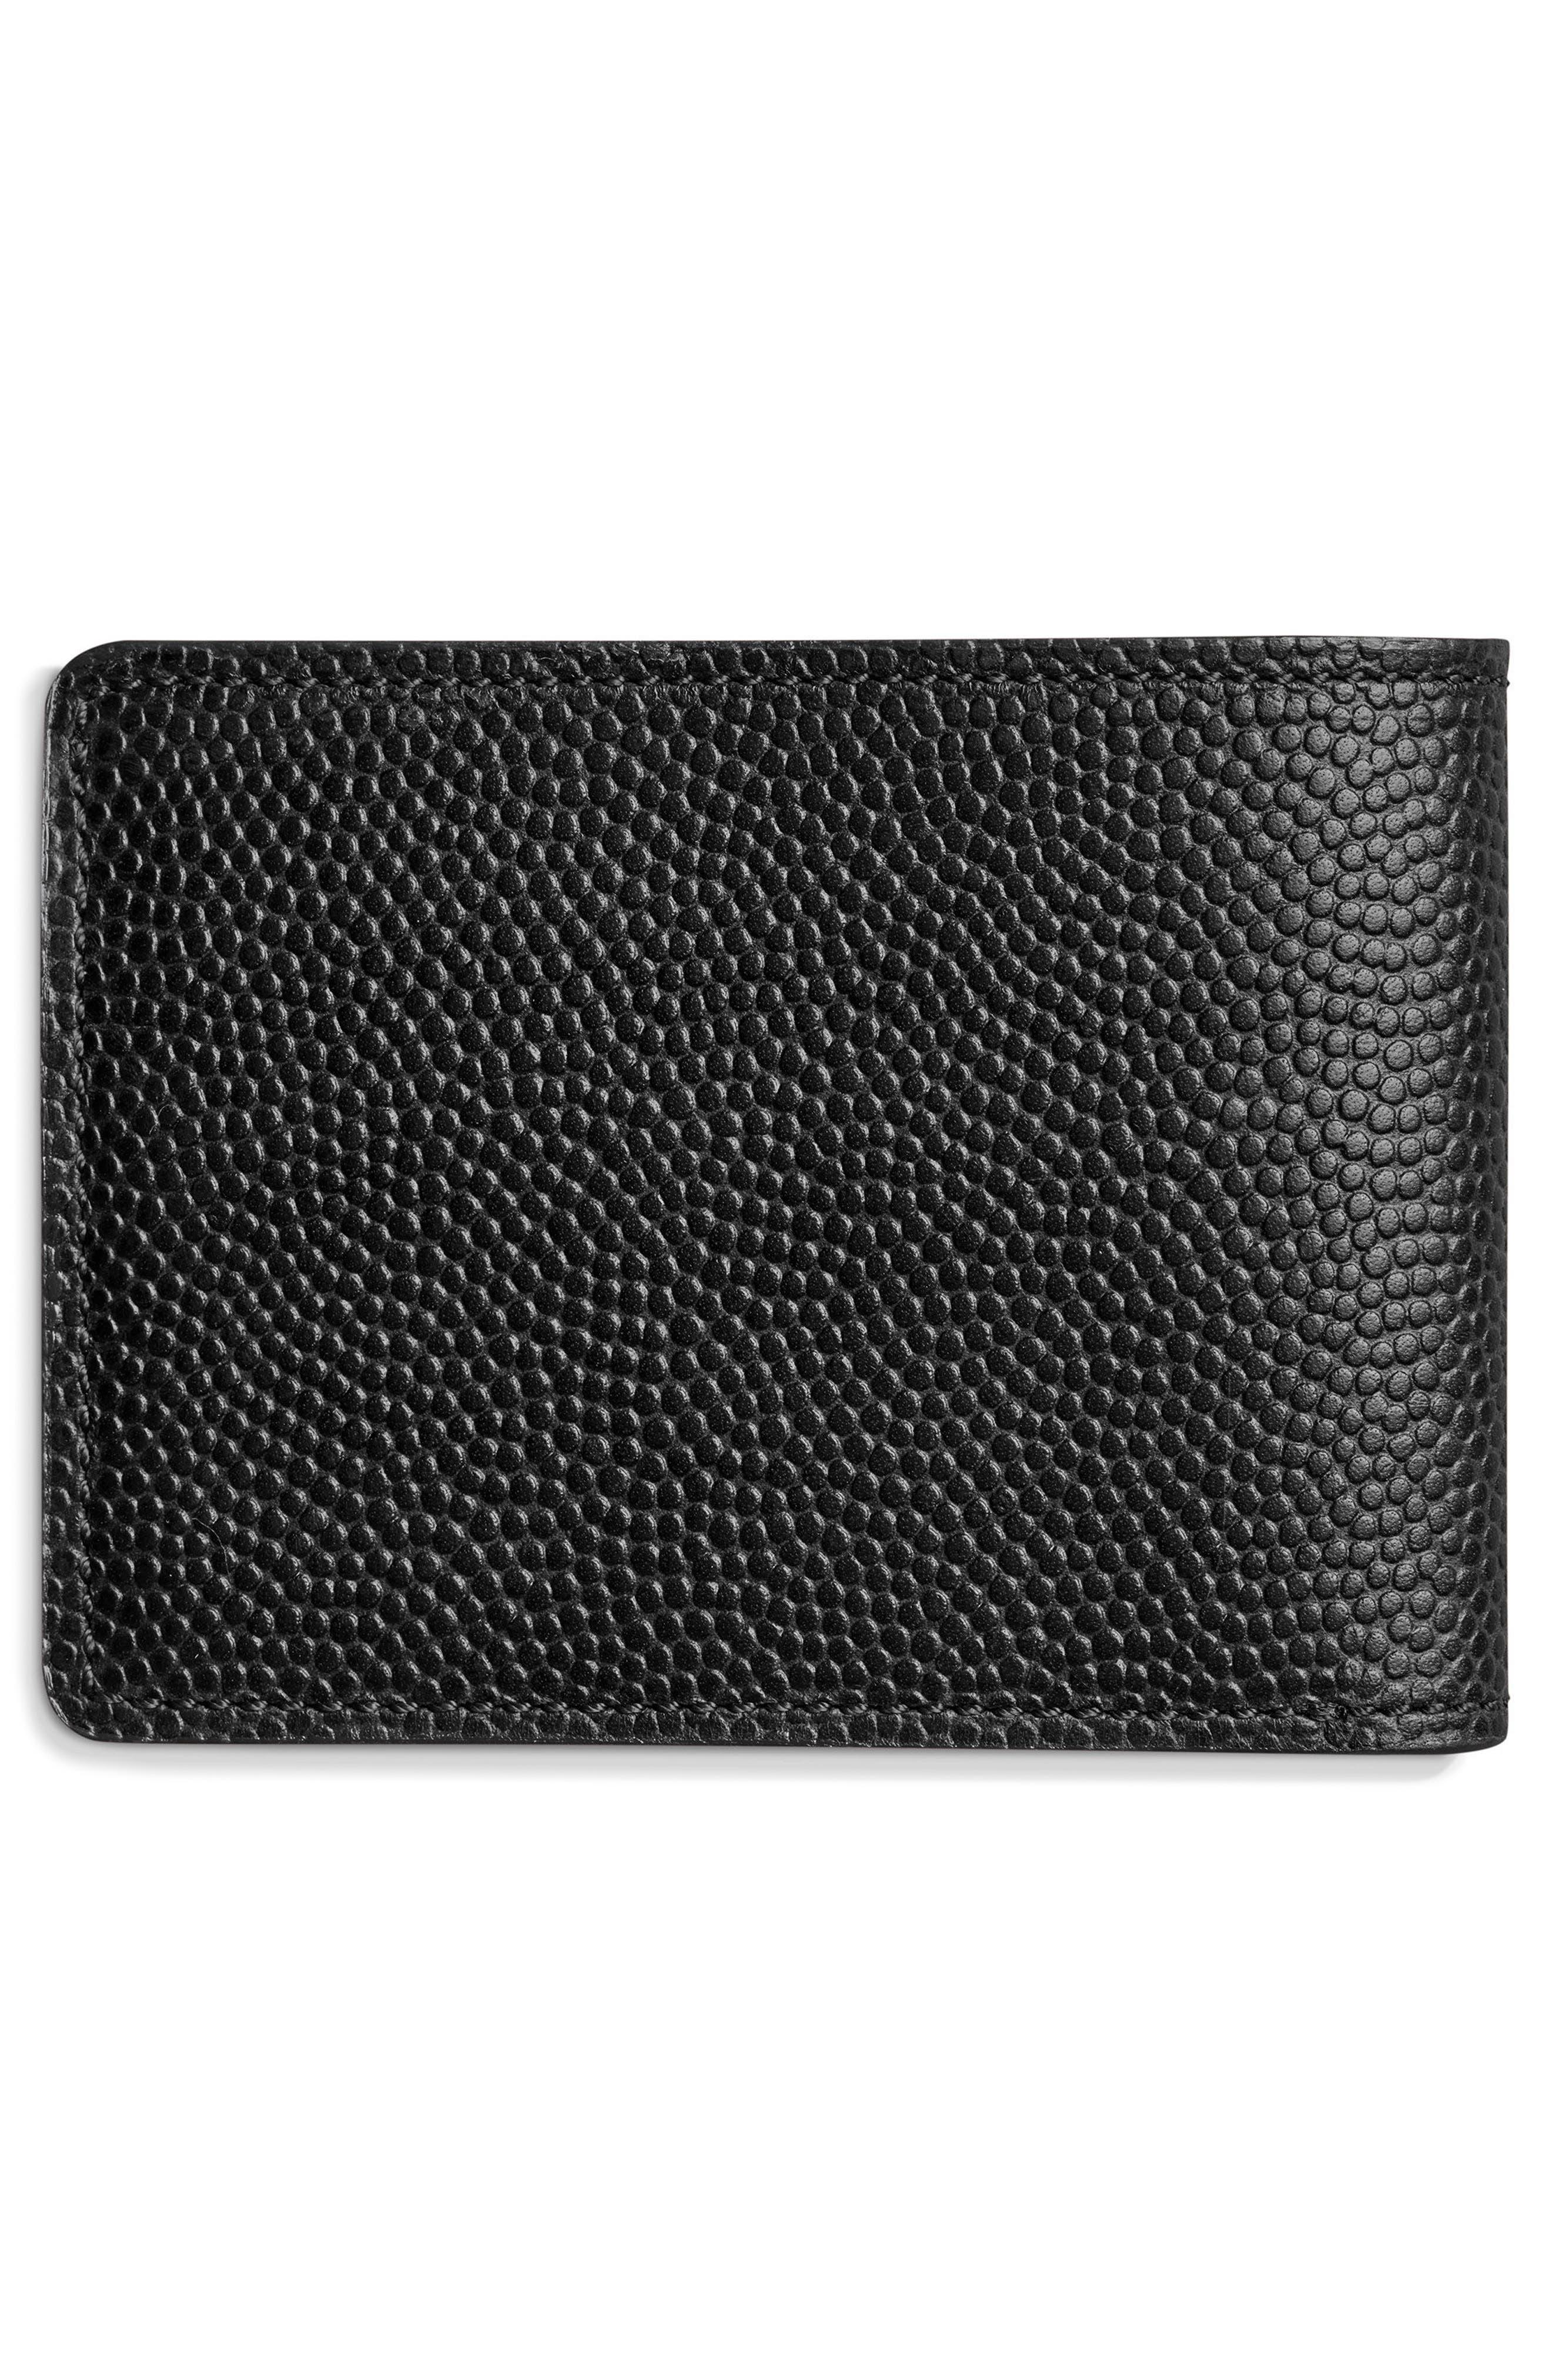 Slim Bifold 2.0 Leather Wallet,                             Alternate thumbnail 2, color,                             BLACK